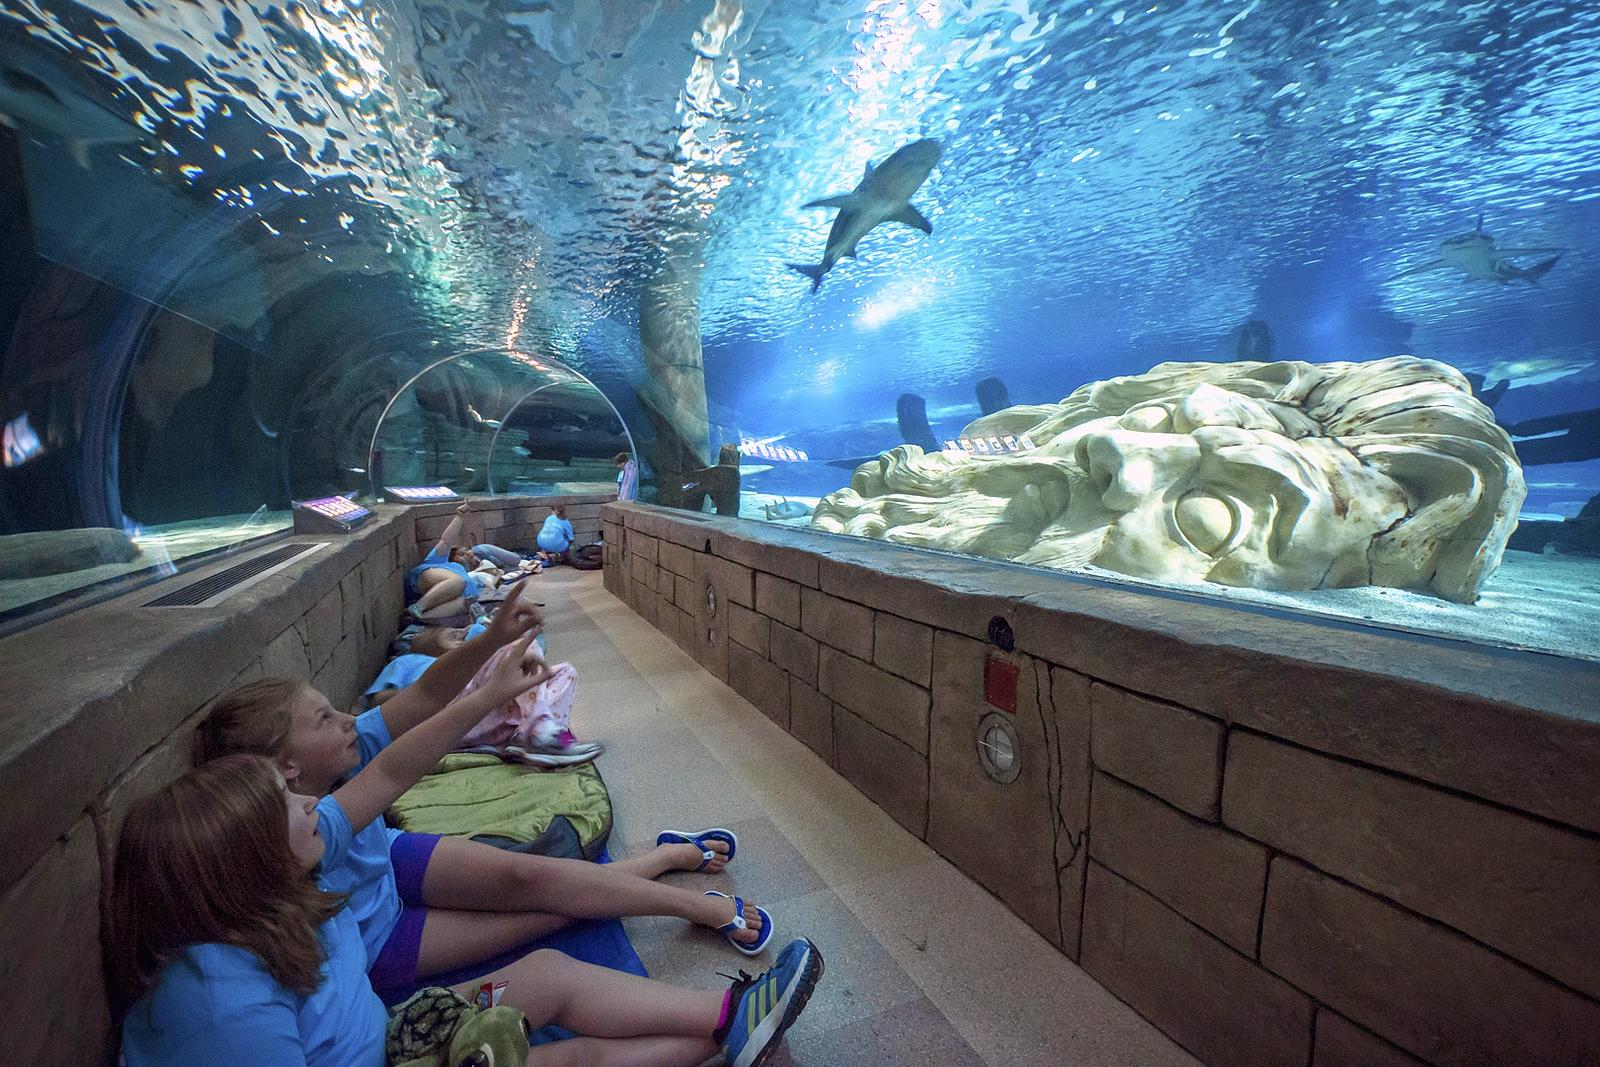 visit an acquarium minnesota